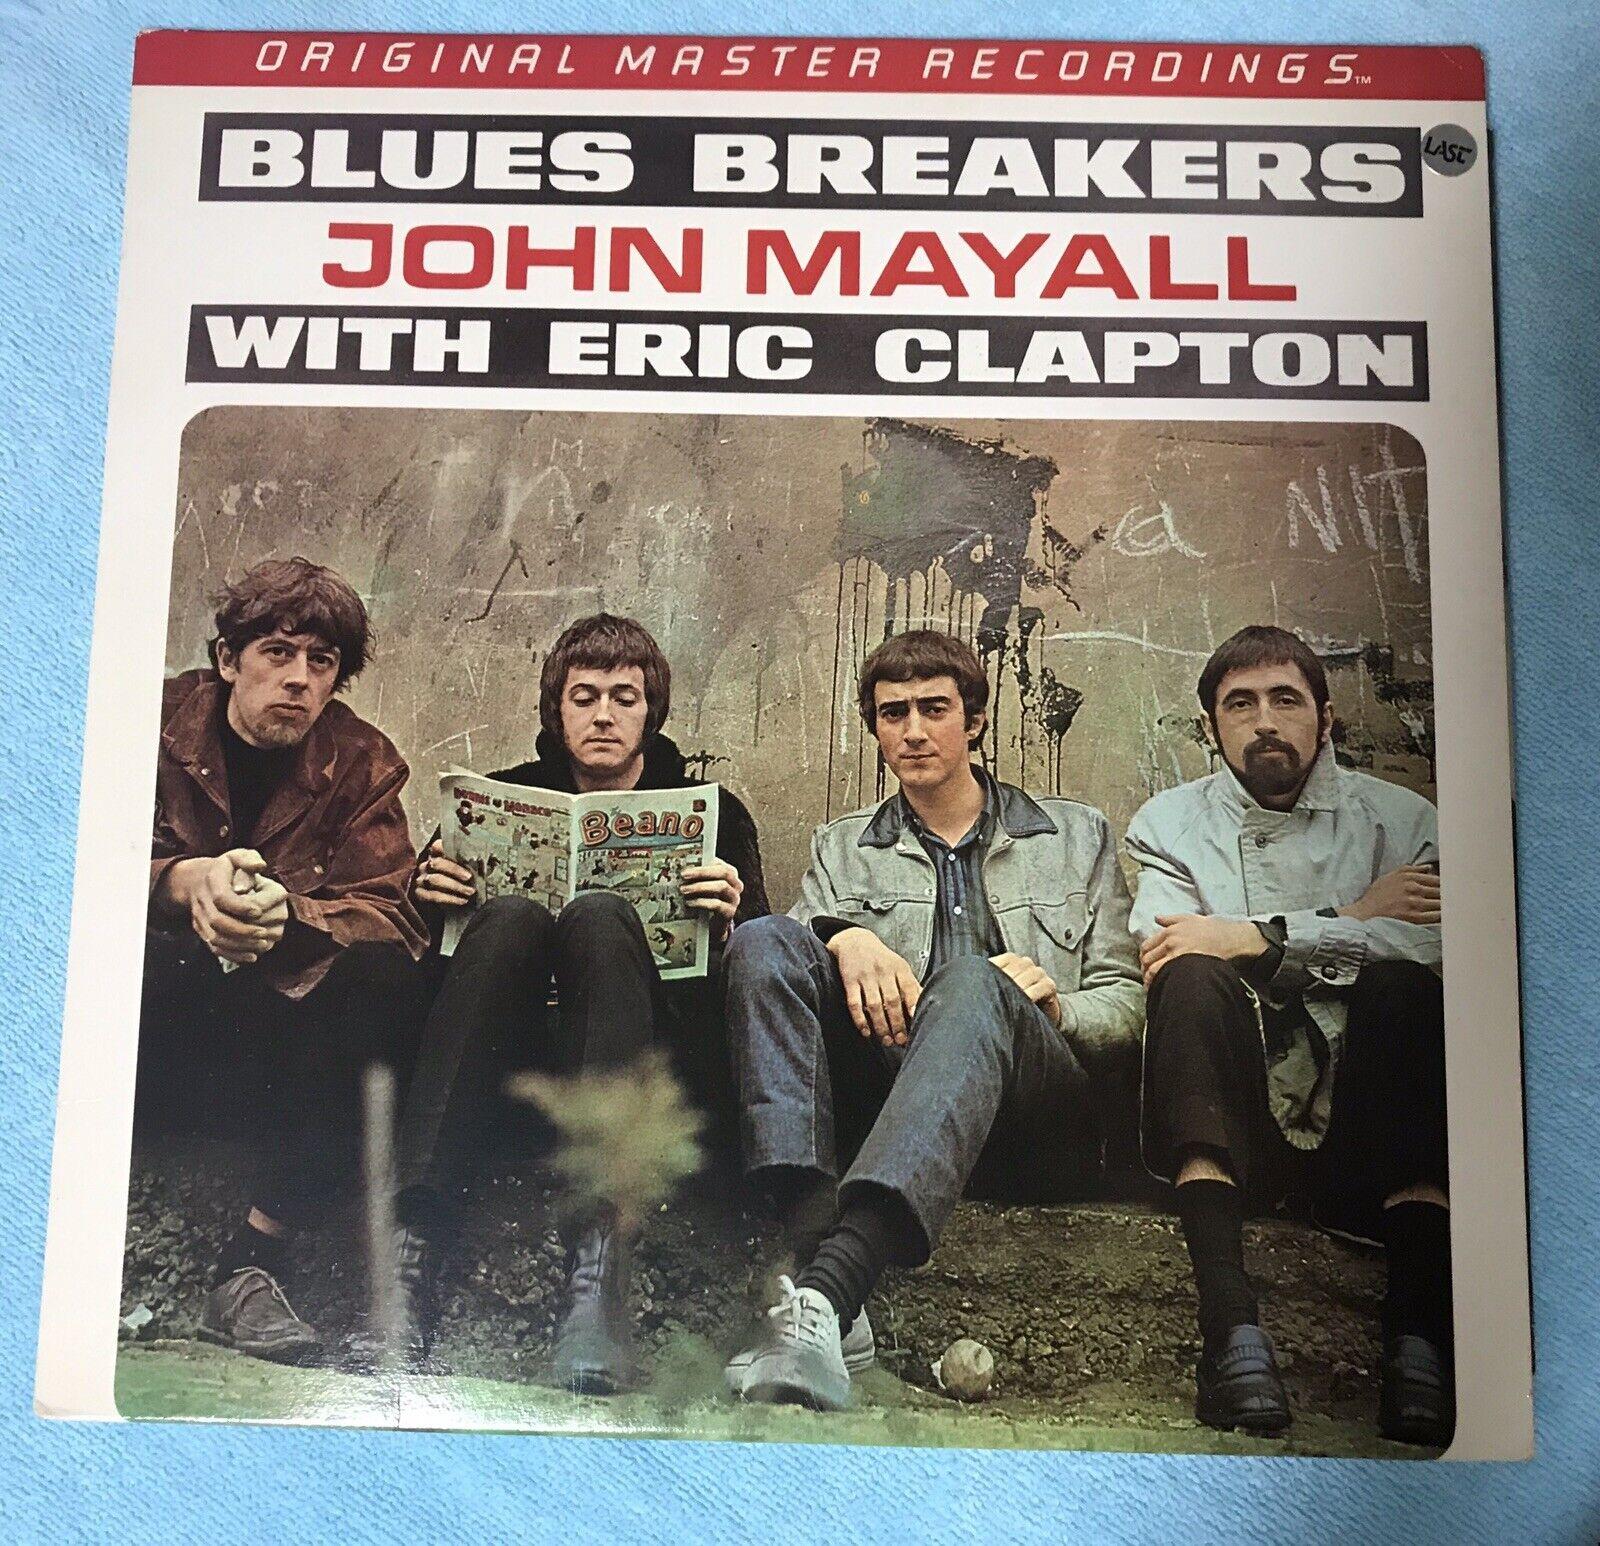 ERIC CLAPTON - JOHN MAYALL BLUES BREAKERS - 1984 ORIGINAL MASTER RECORDING VINYL